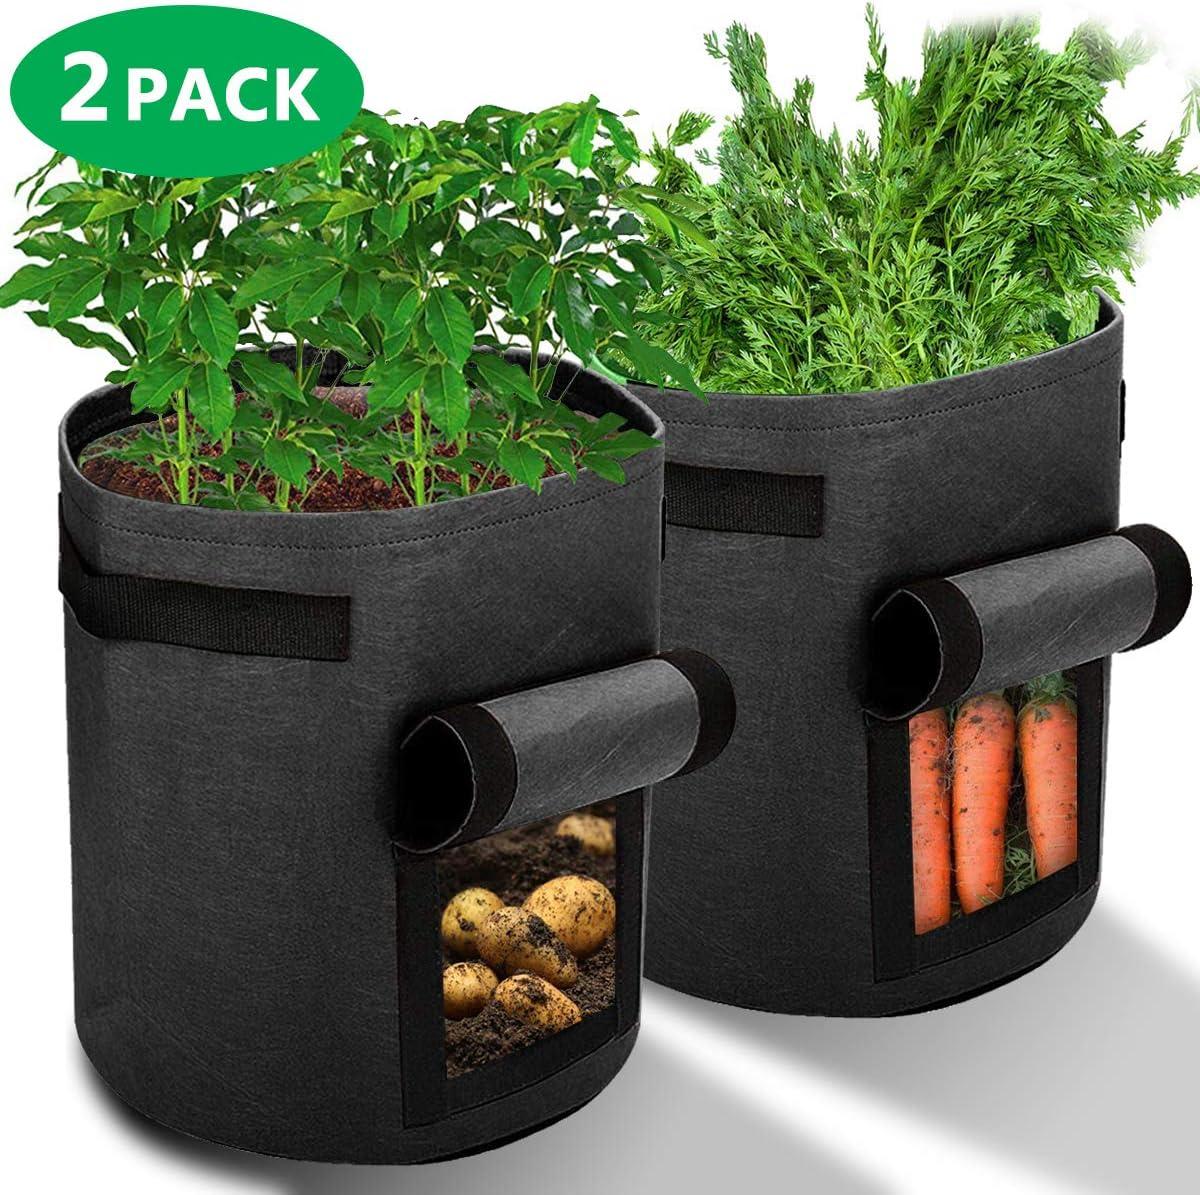 Ankier Potato Growing Bags 2 Pack 7 Gallon Vegetable Grow Bags